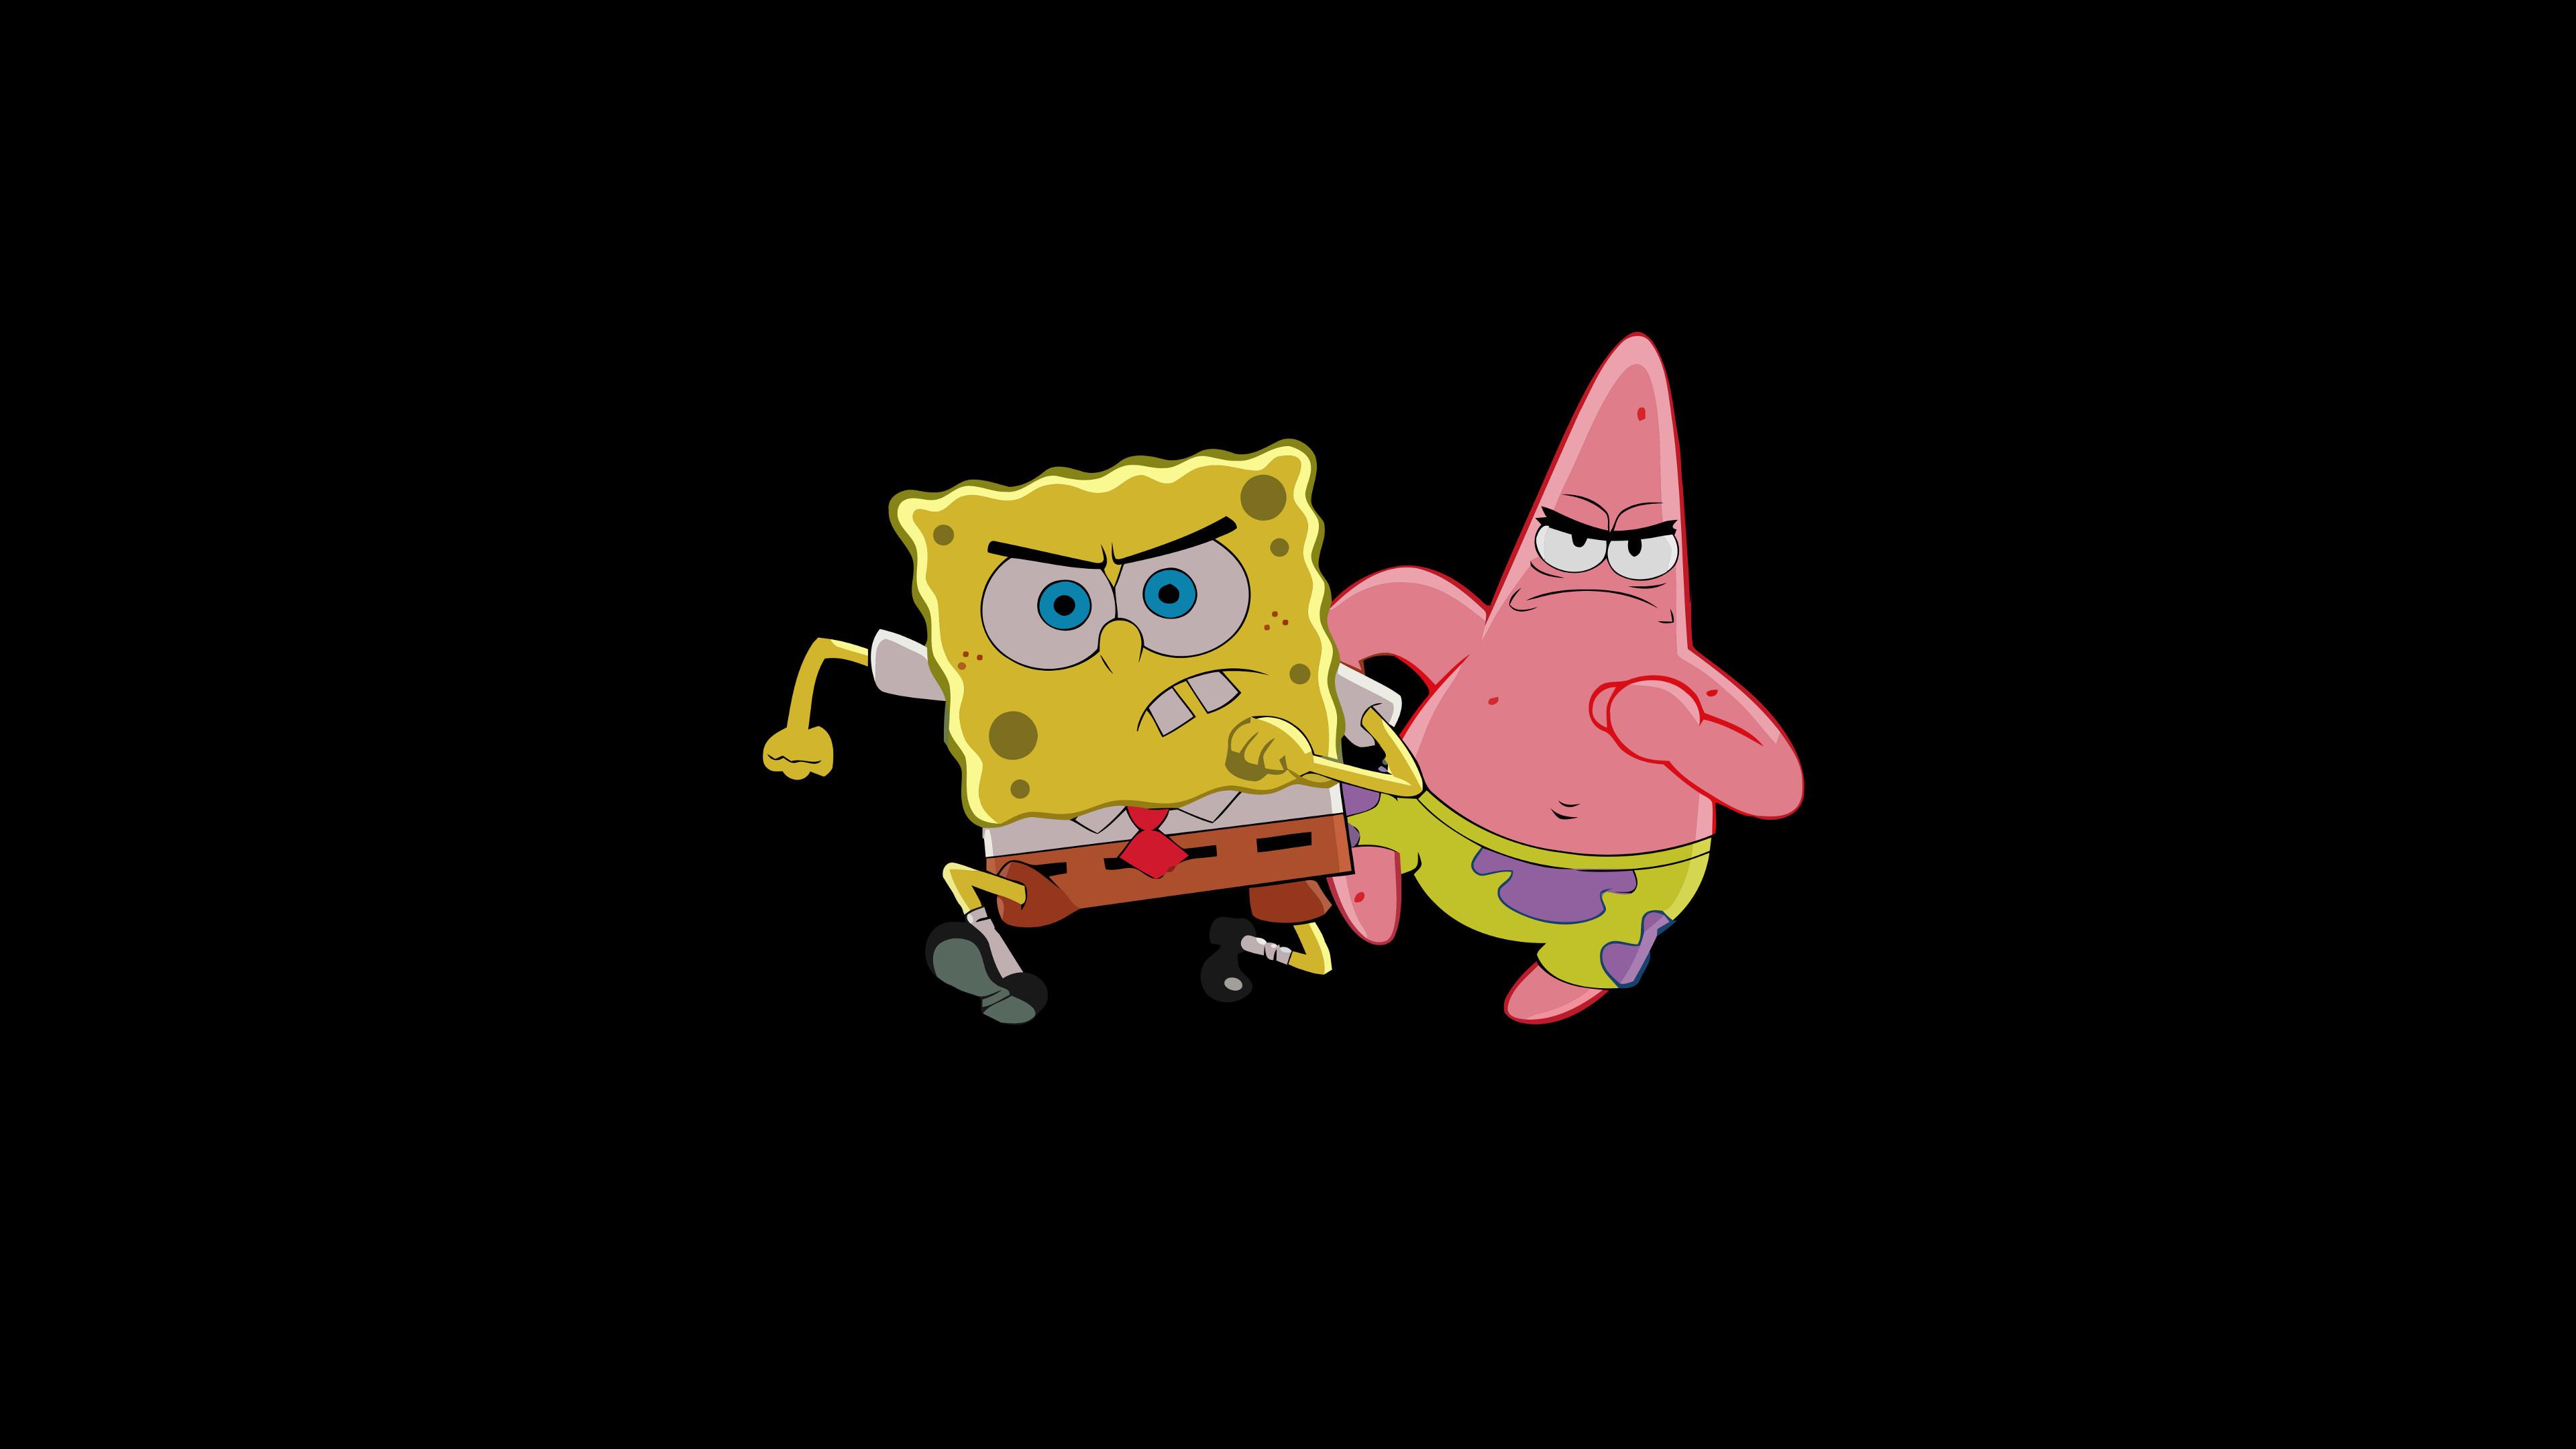 General simple simple background black background SpongeBob  SquarePants Patrick Star